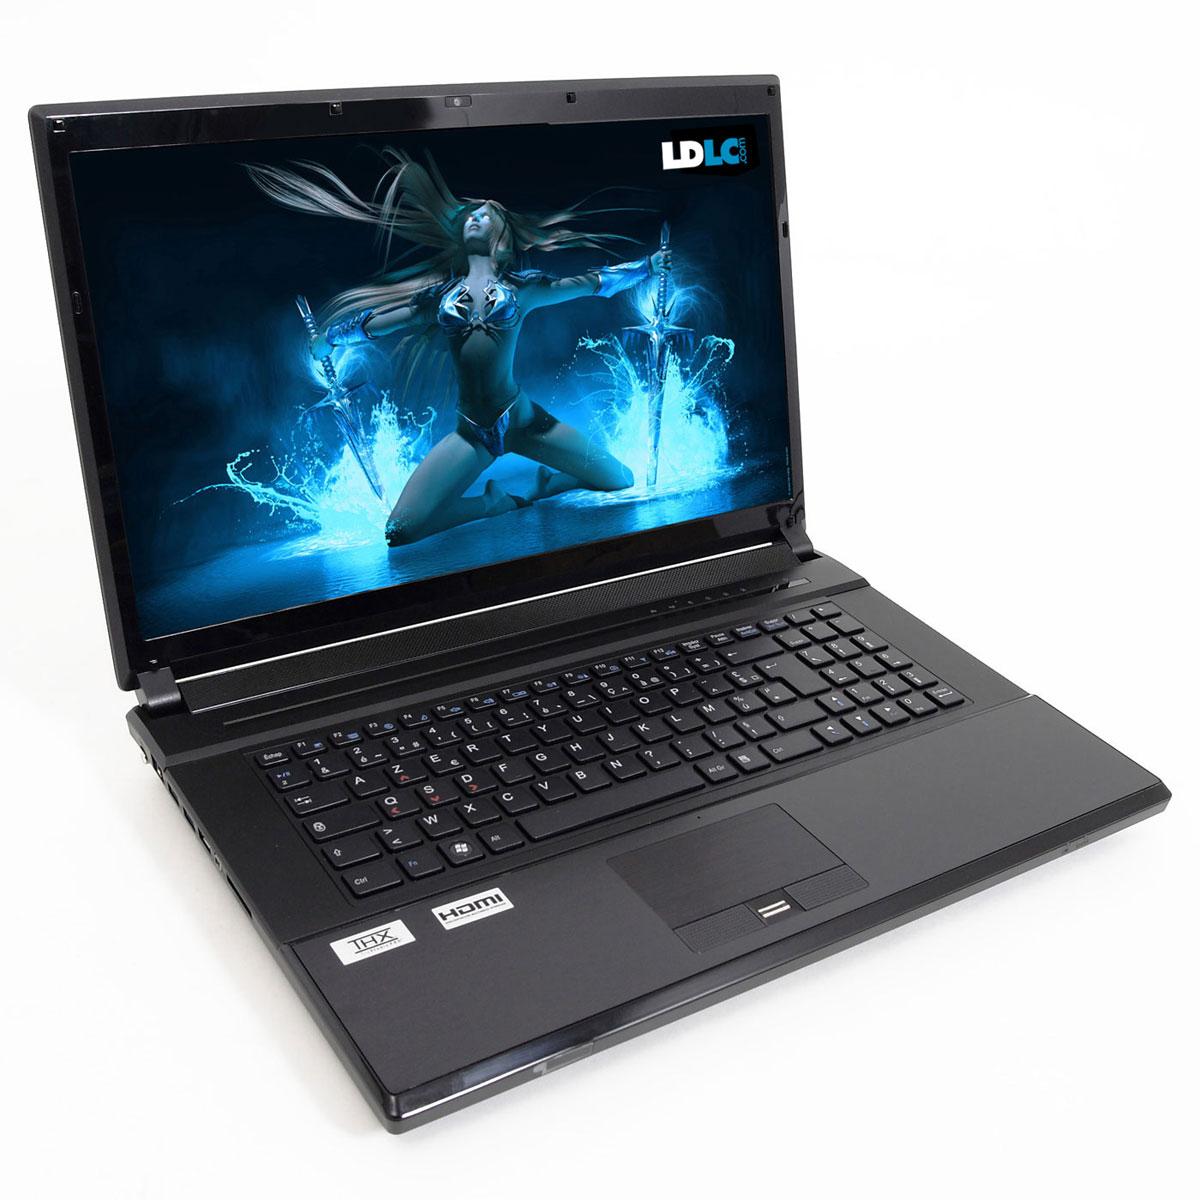 "PC portable LDLC Bellone GA2-I7-8-H7+ Intel Core i7-2670QM 8 Go 1 To 17.3"" LED NVIDIA GeForce GTX 560M Graveur DVD Wi-Fi N/Bluetooth Webcam (sans OS)"